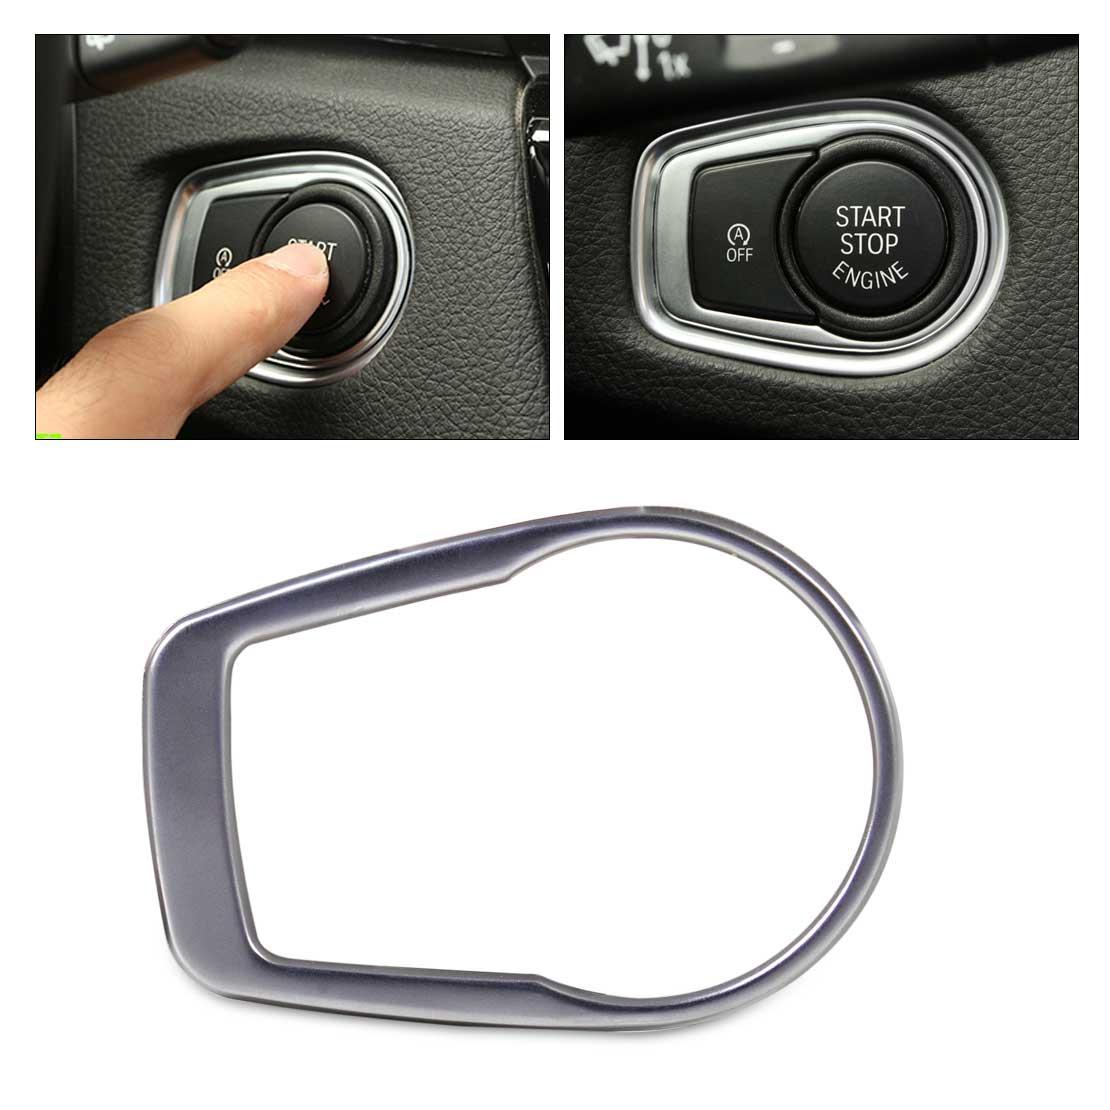 Aliexpress.com : Buy DWCX Car Chrome Interior Key Start